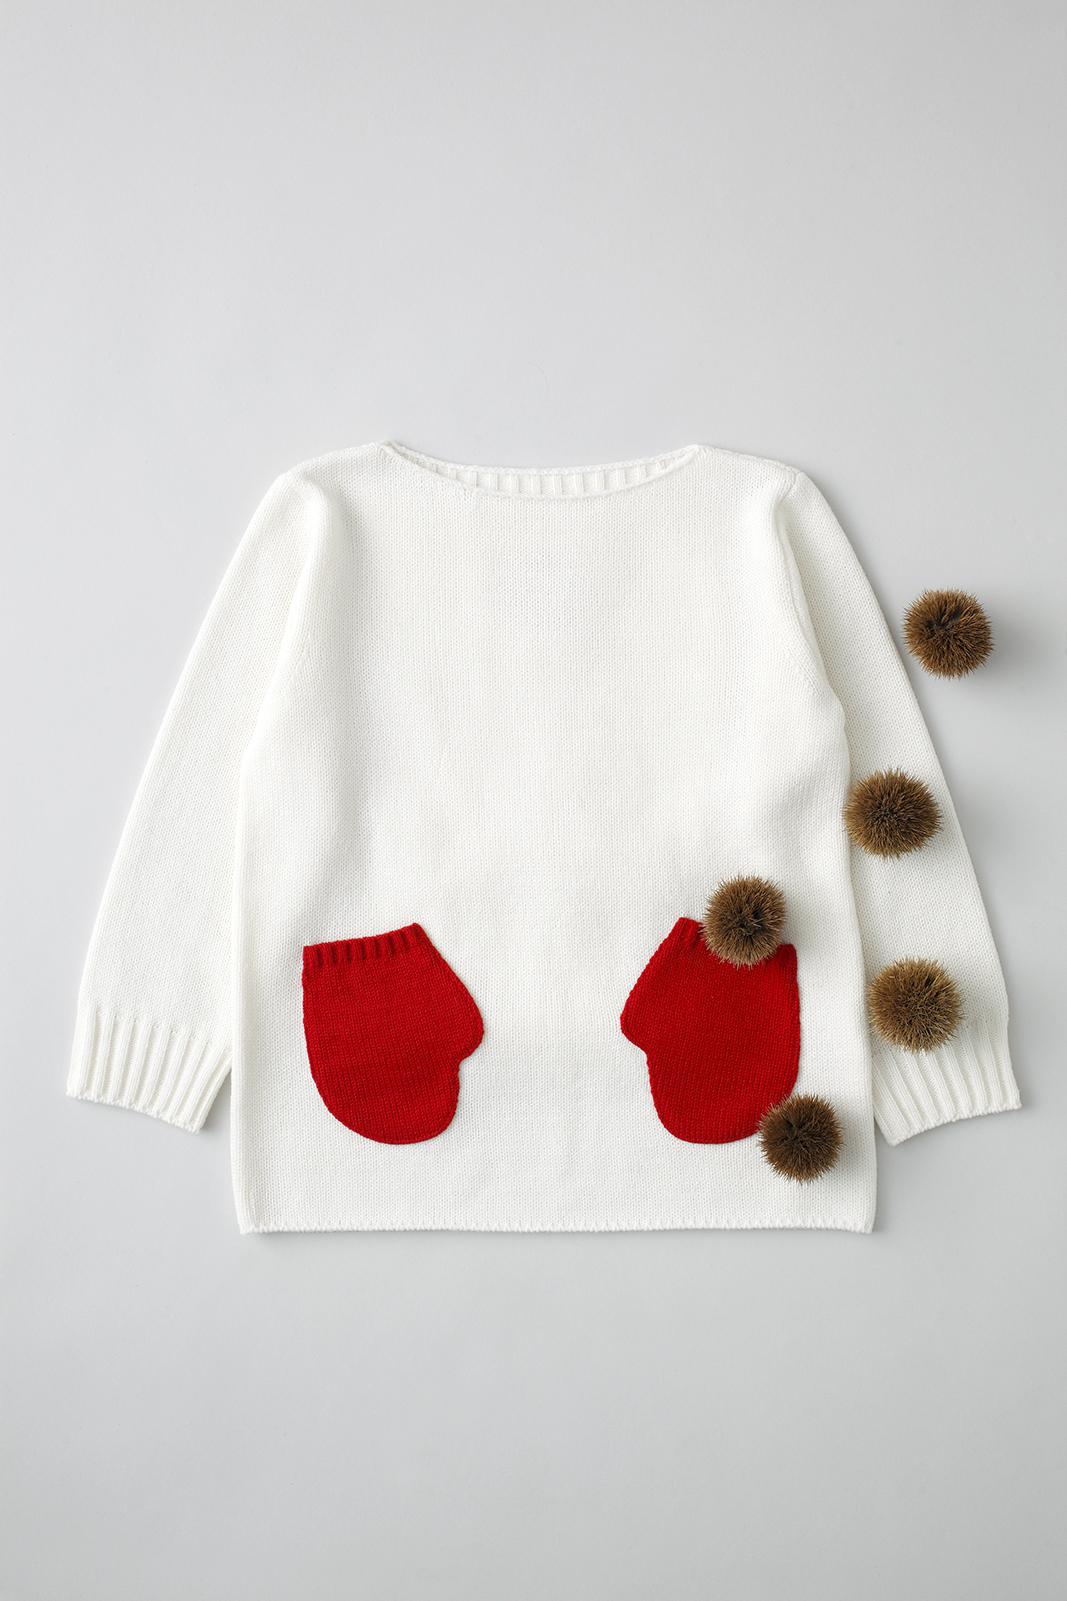 Camphor カンフル ニット knitwear kids こども 子供服 mittensweater